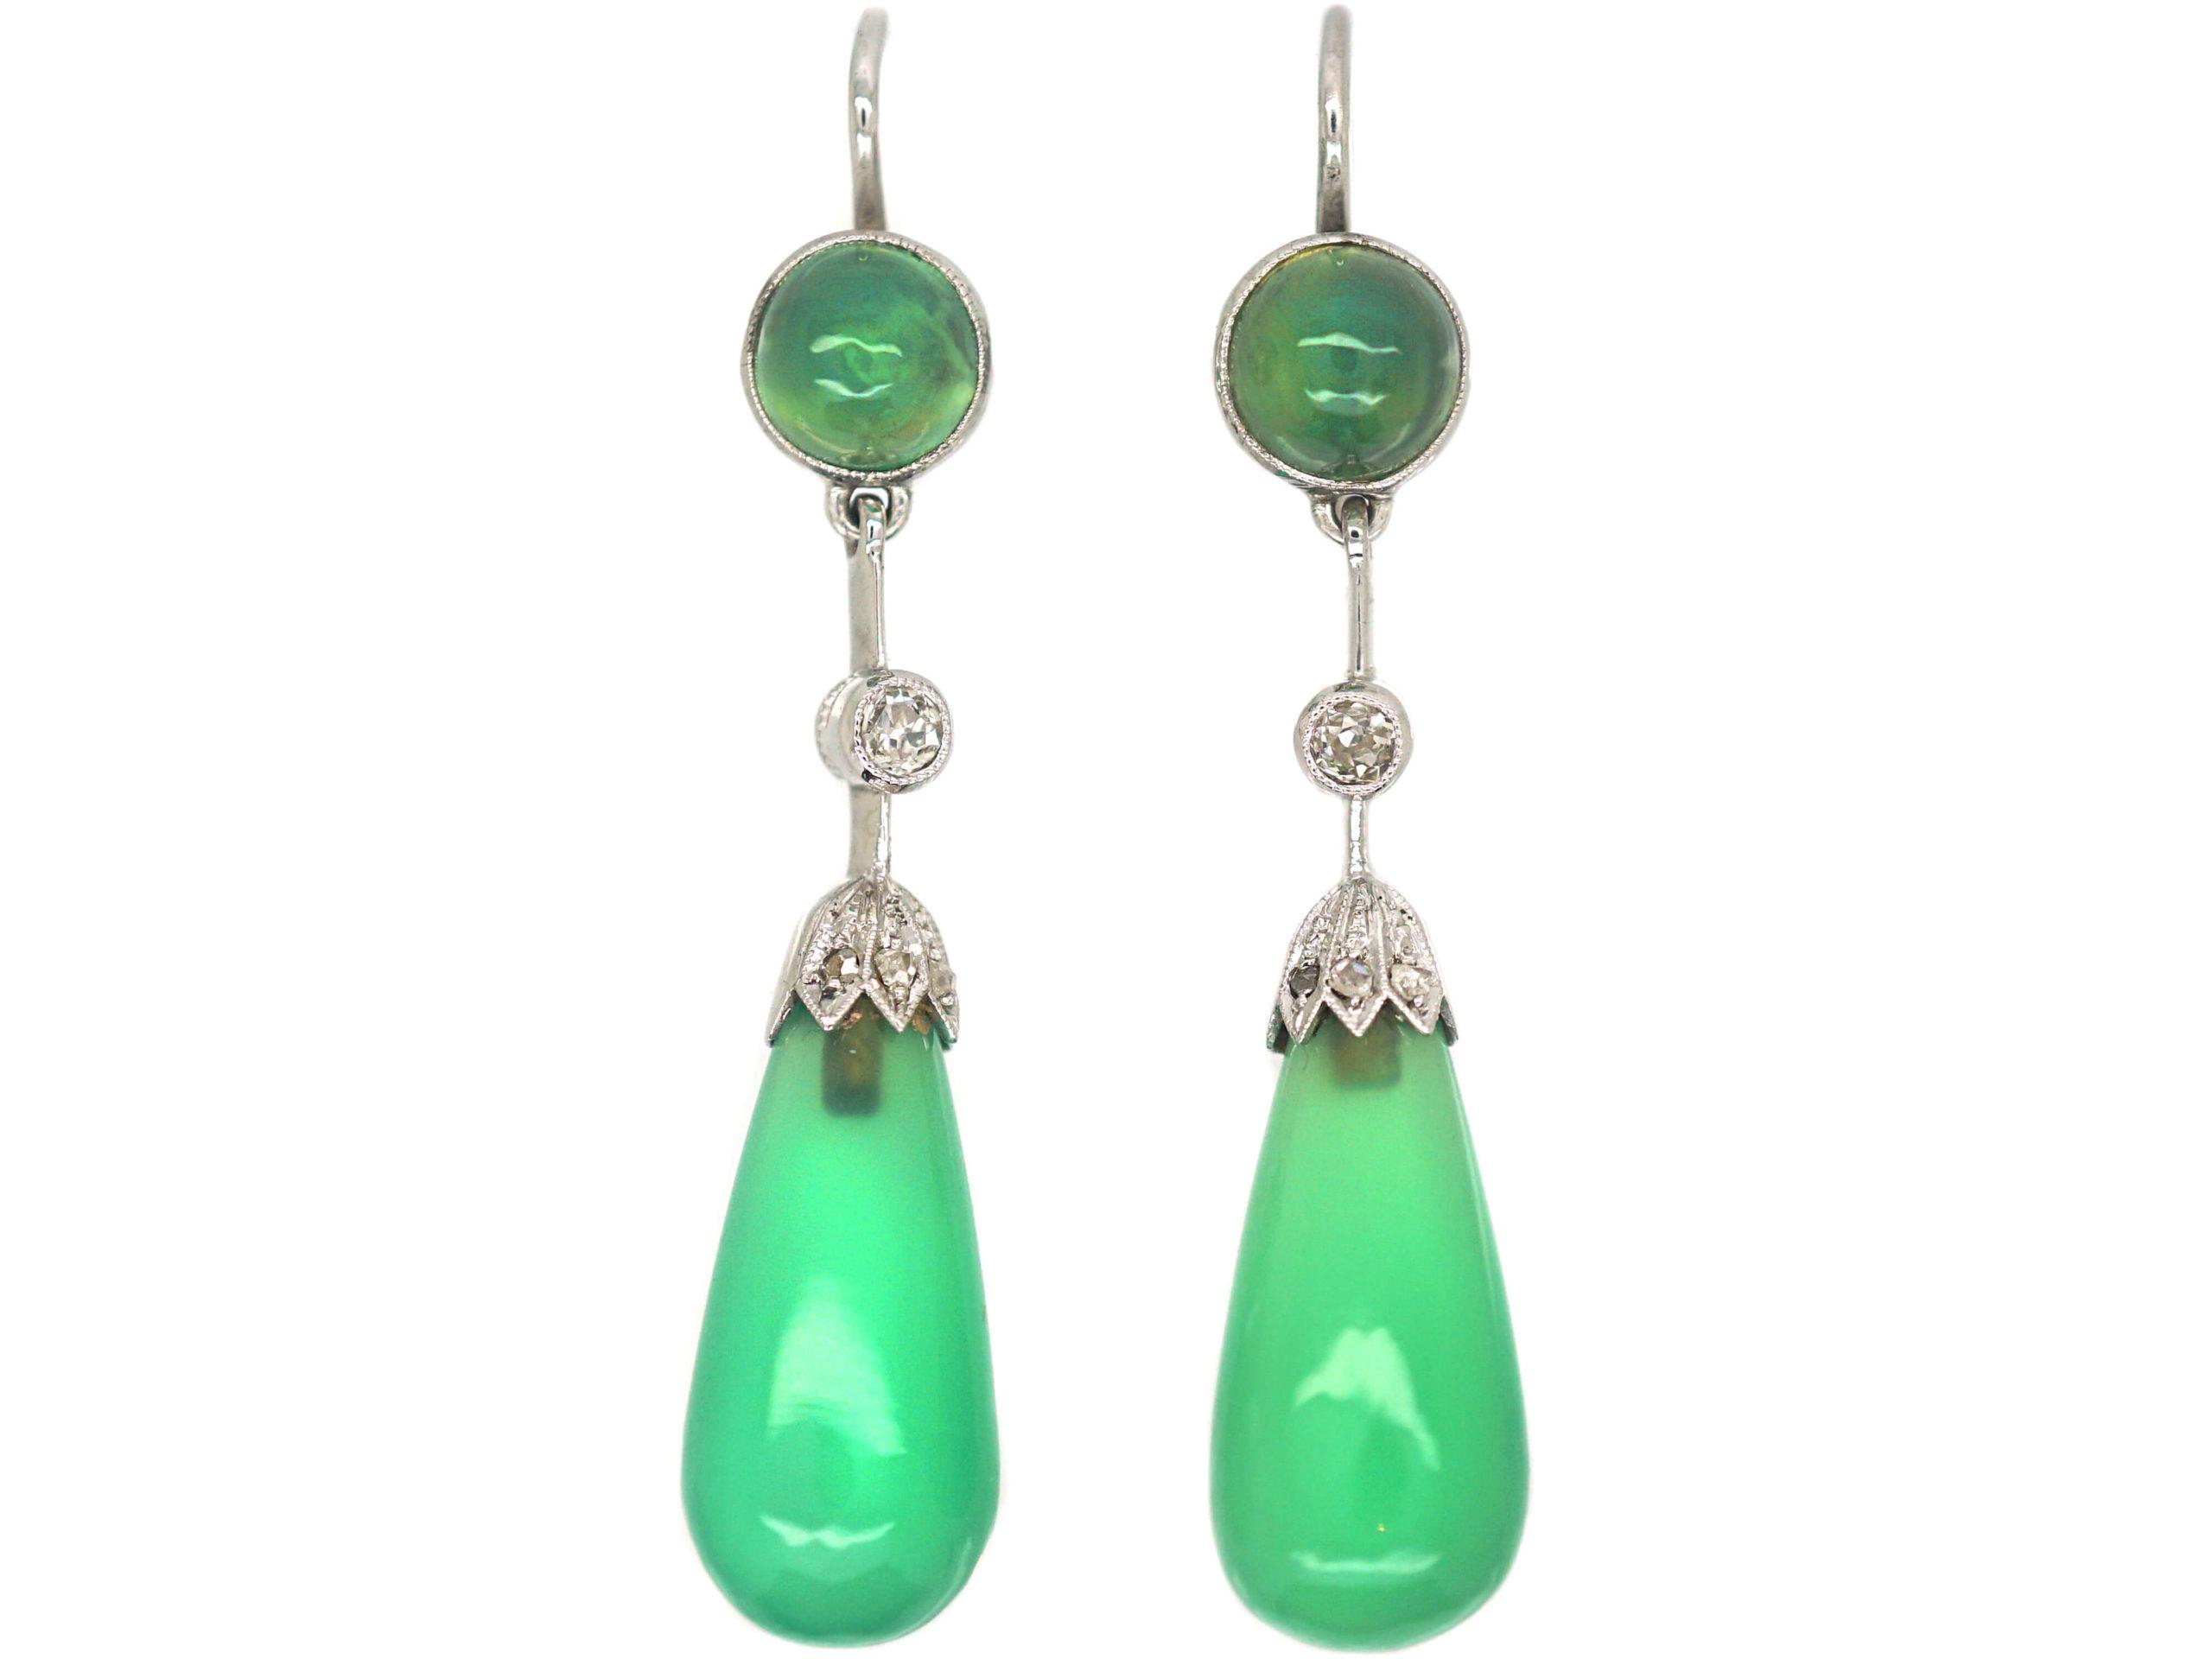 Edwardian Platinum, Chrysoprase & Diamond Drop Earrings